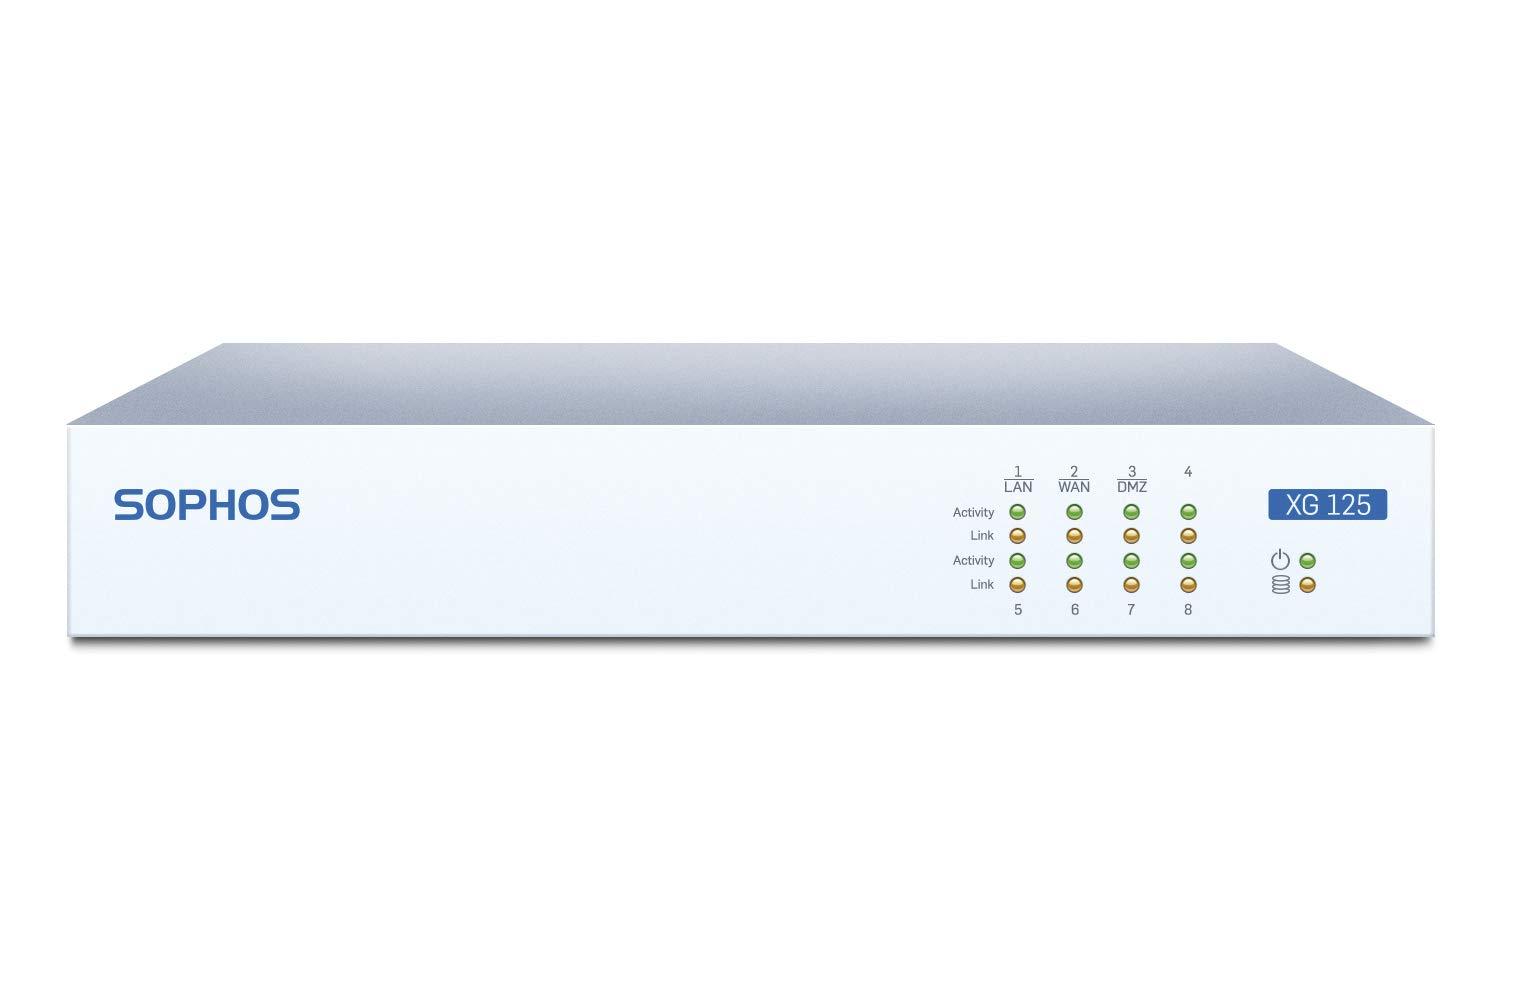 Sophos XG 125 Rev.2 TotalProtect 2 YR Bundle VPN Firewall Appliance and FullGuard License 2 Year